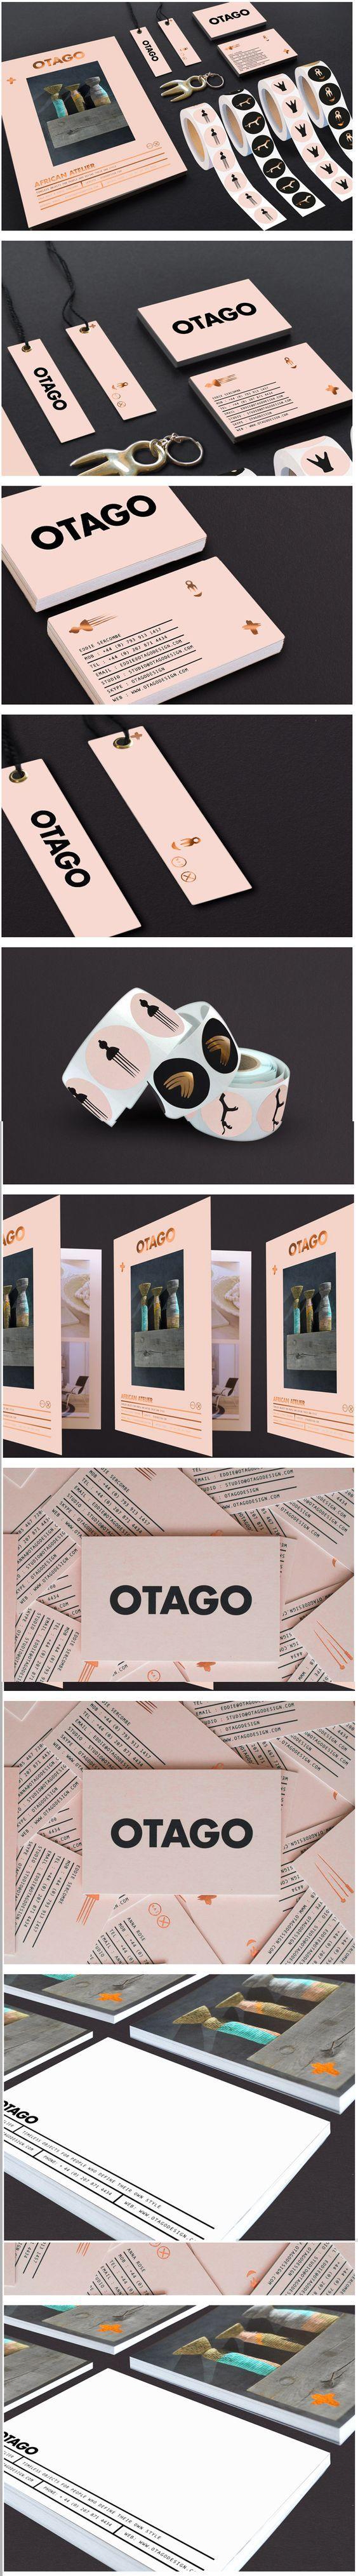 Otago Branding   Fivestar Branding – Design and Branding Agency & Inspiration Gallery